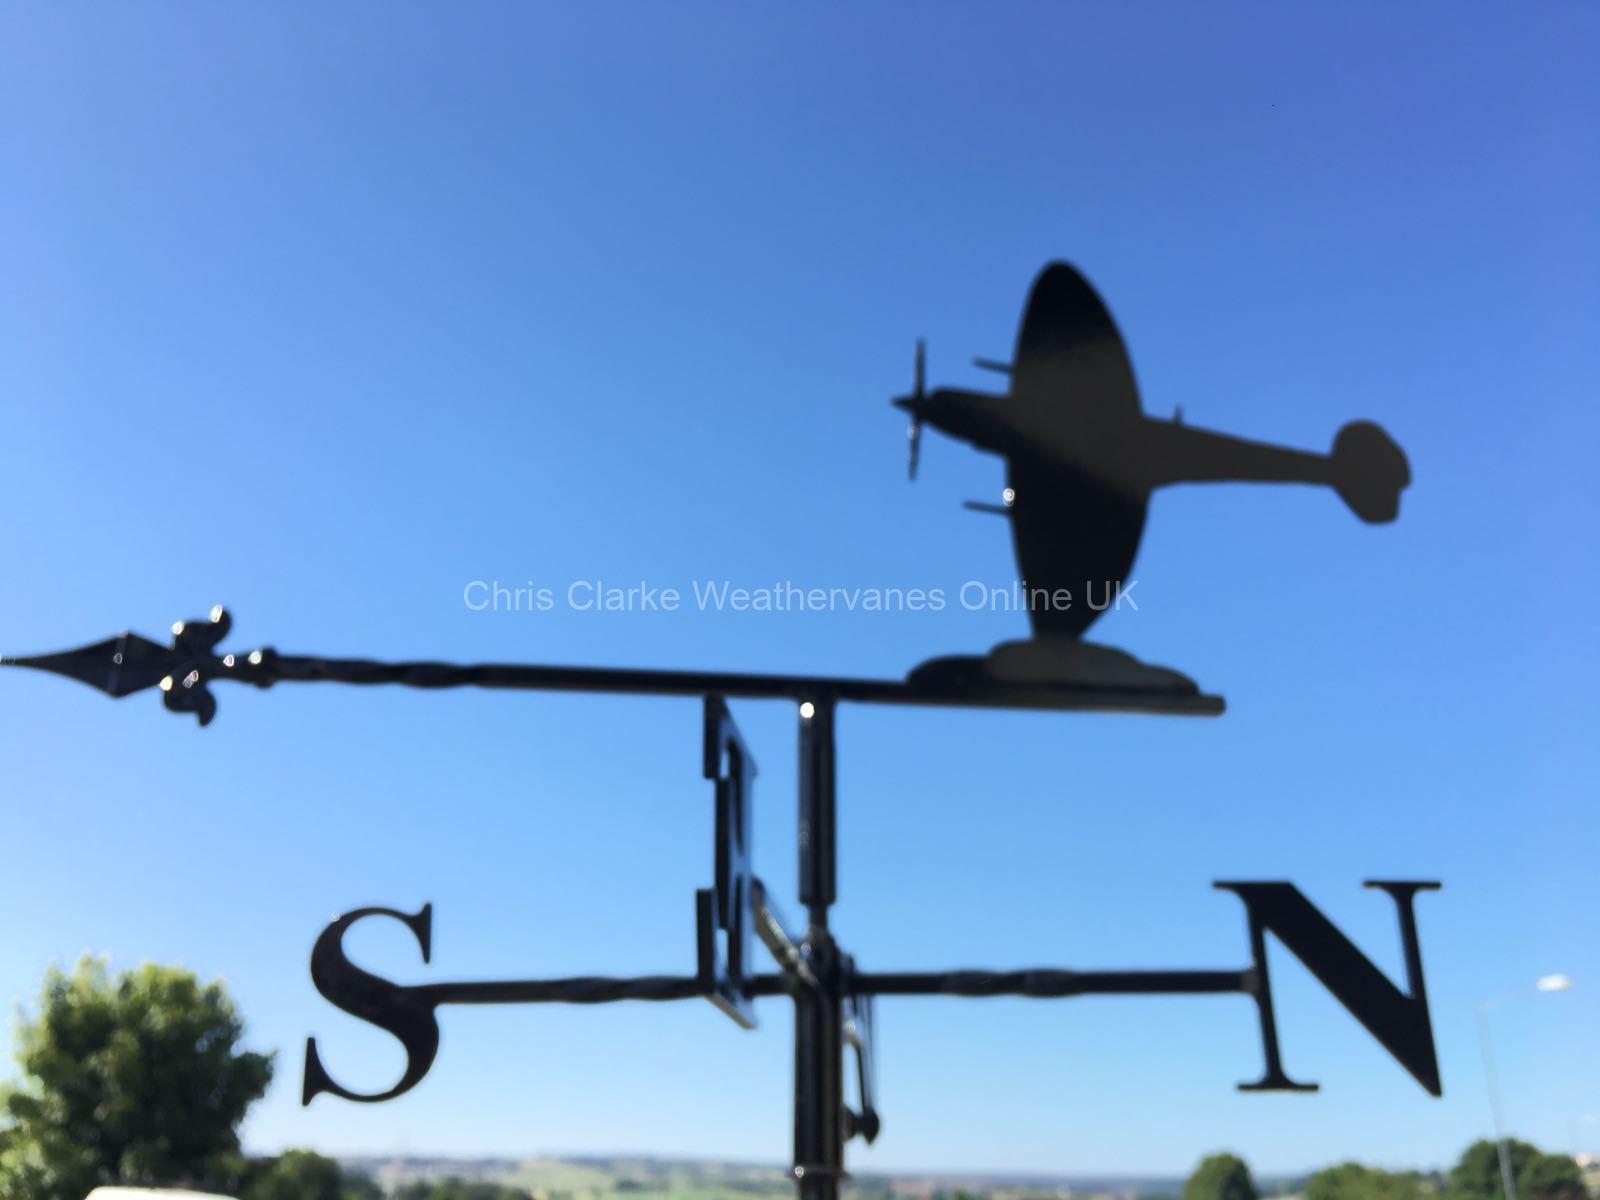 Spitfire-Weathervane